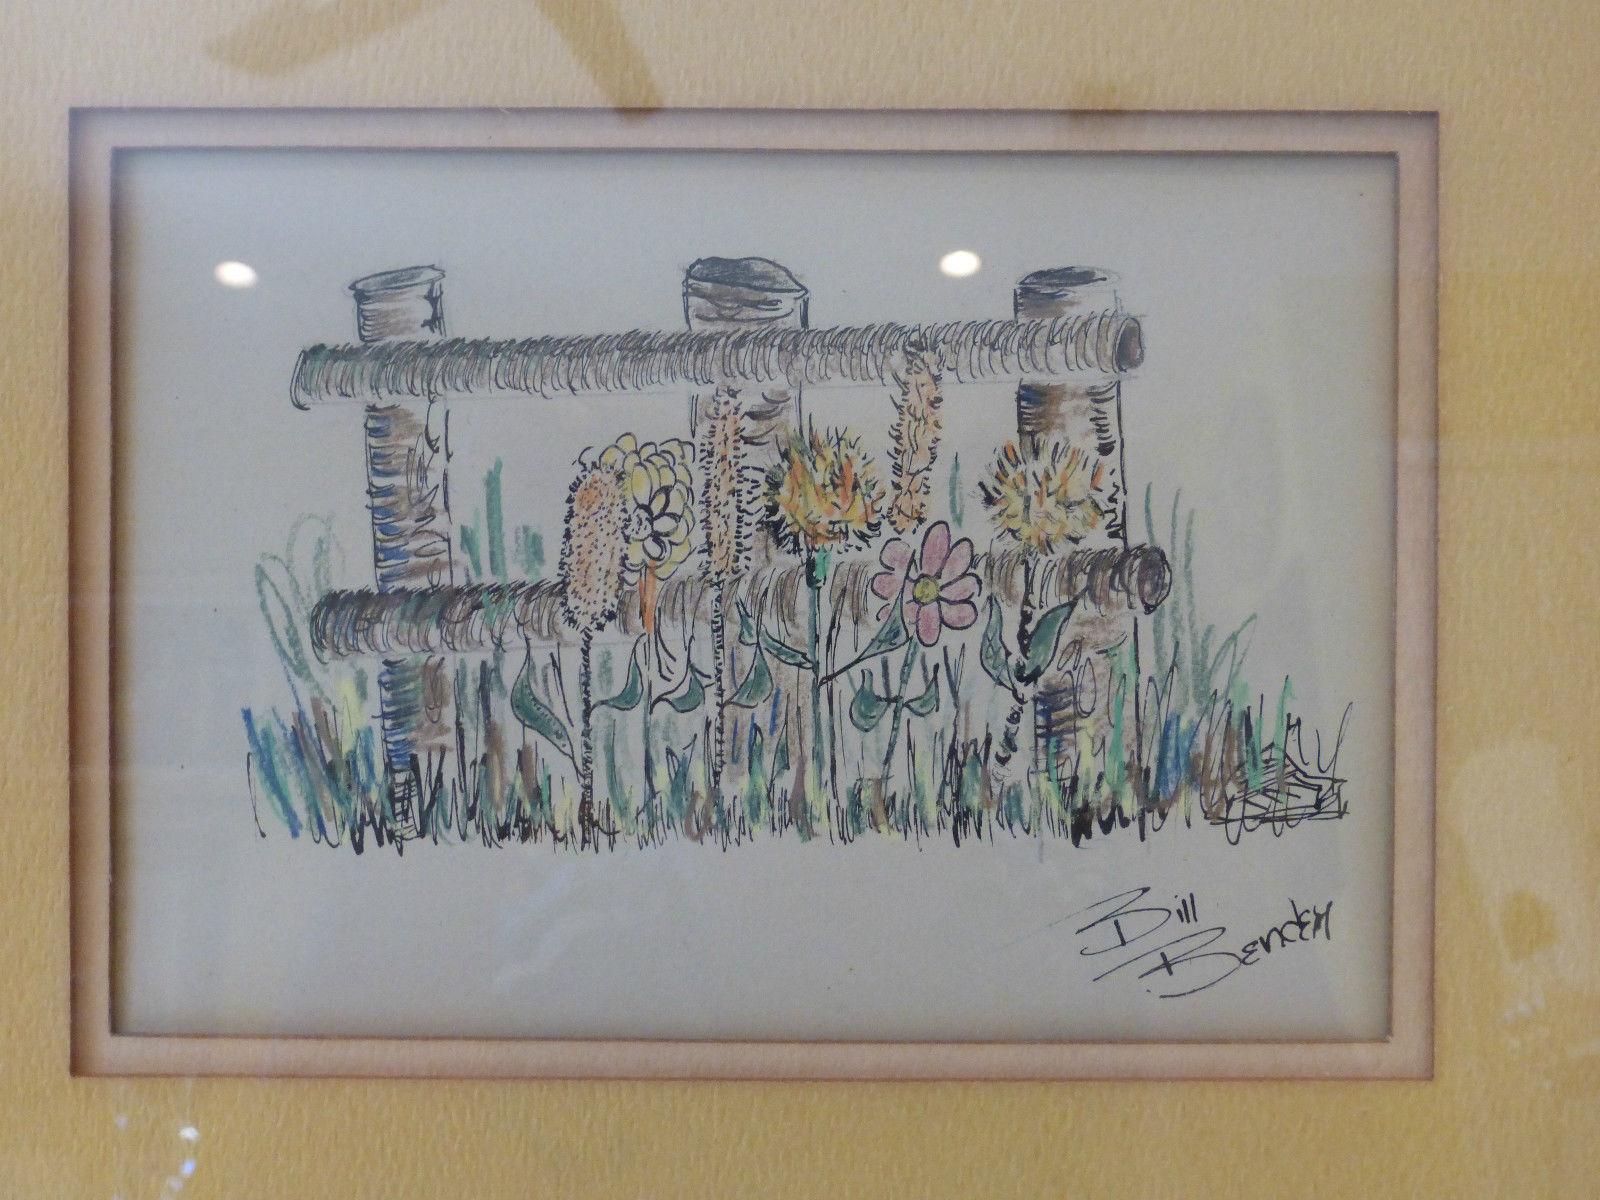 Bill Bender Signed Original Framed Painting